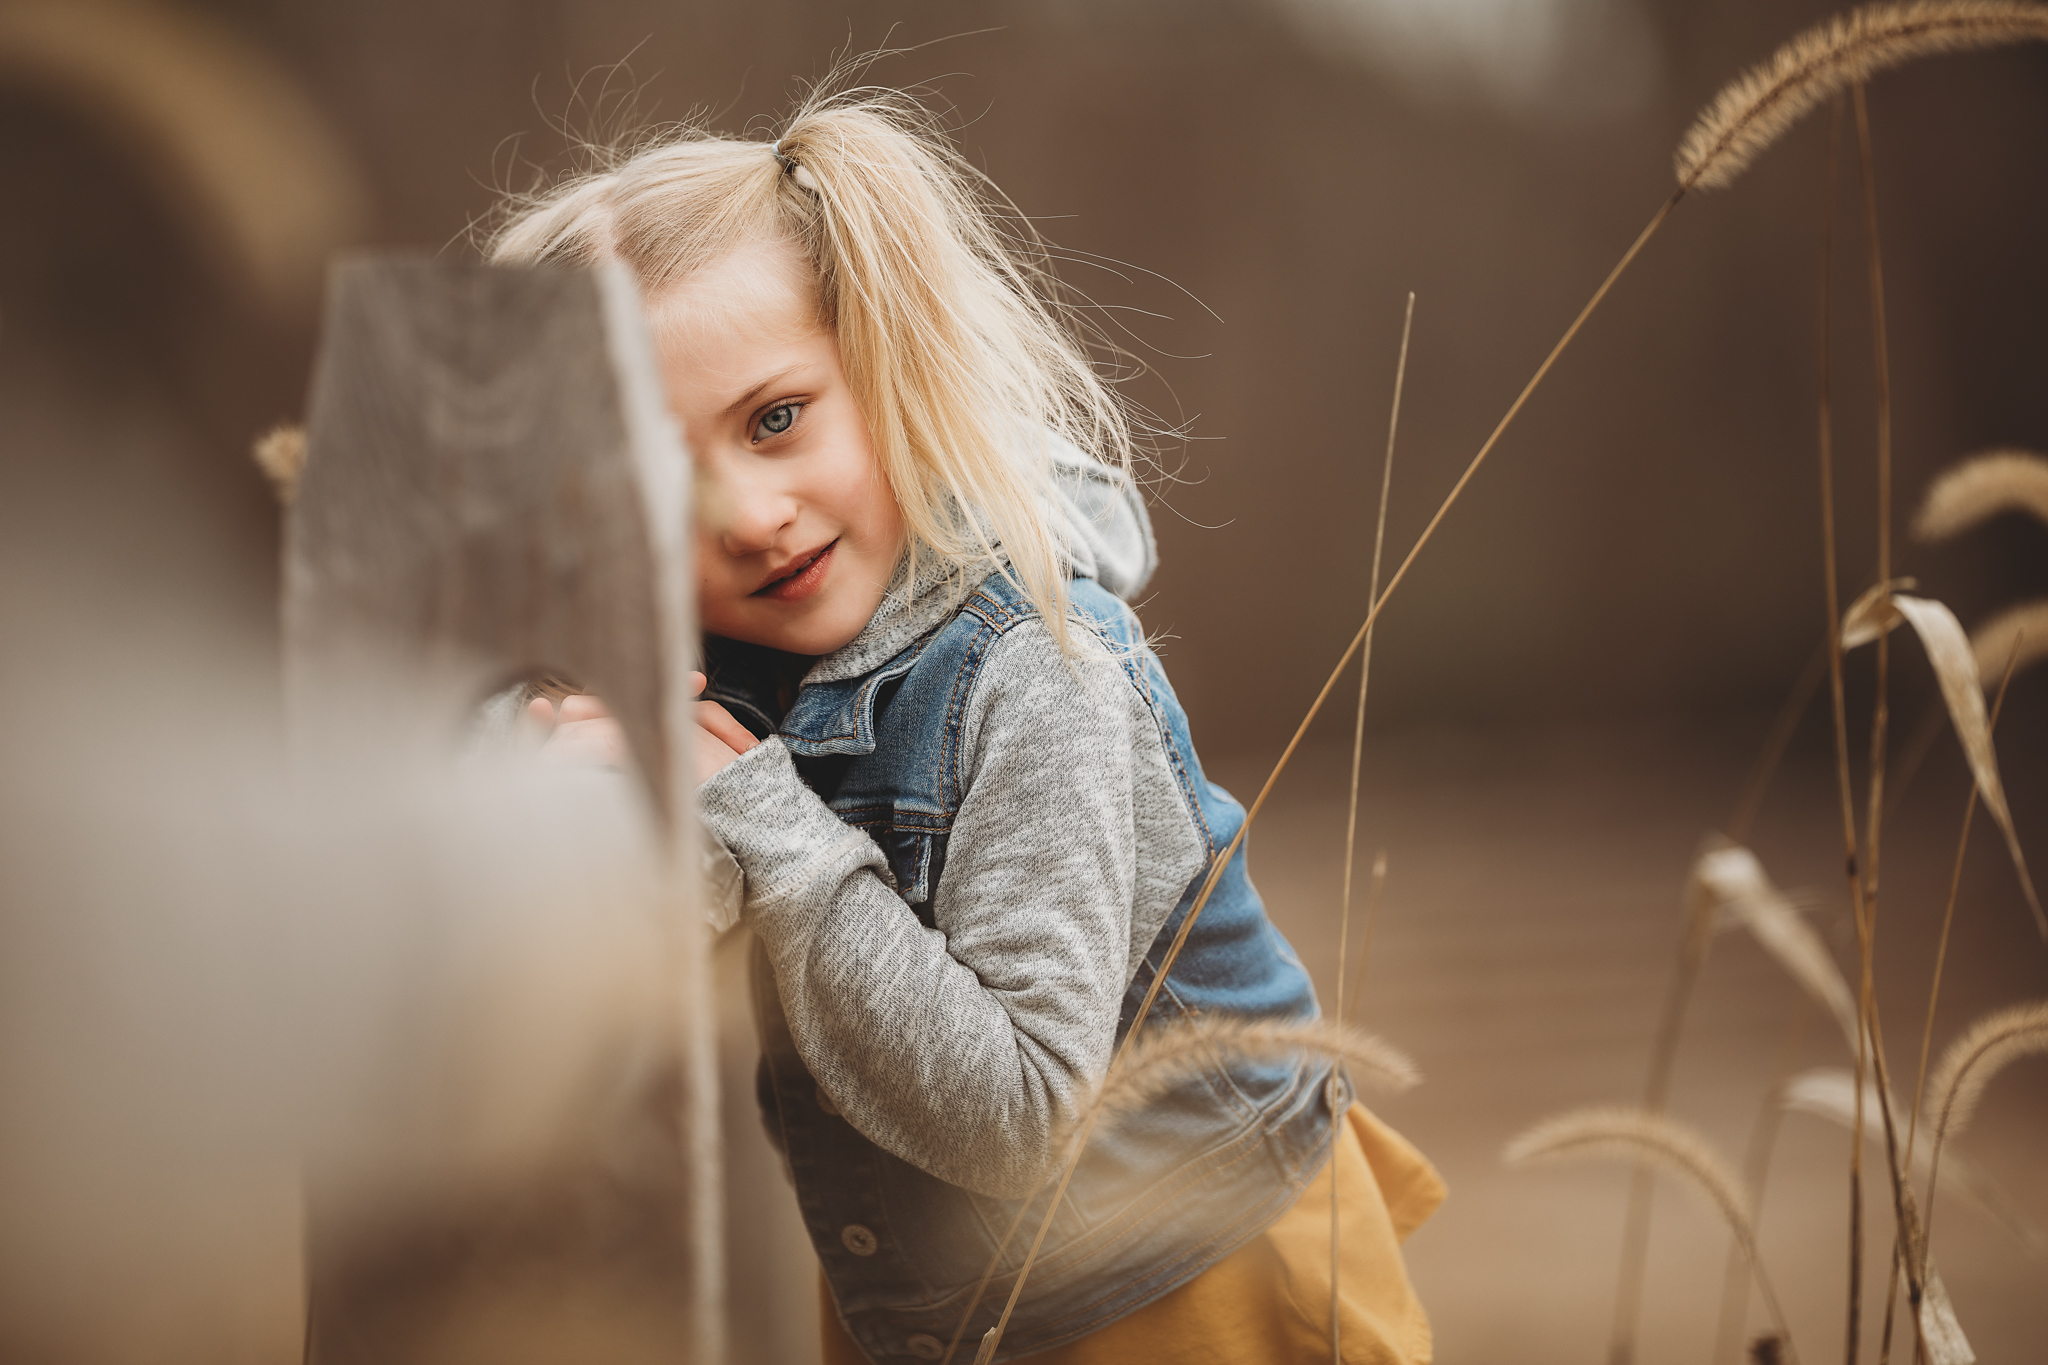 Long-island-photographer-hello-olivia-photography-children-kids-photos-new-york-lifestyle-portraits-suffolk-County-LI-39.jpg